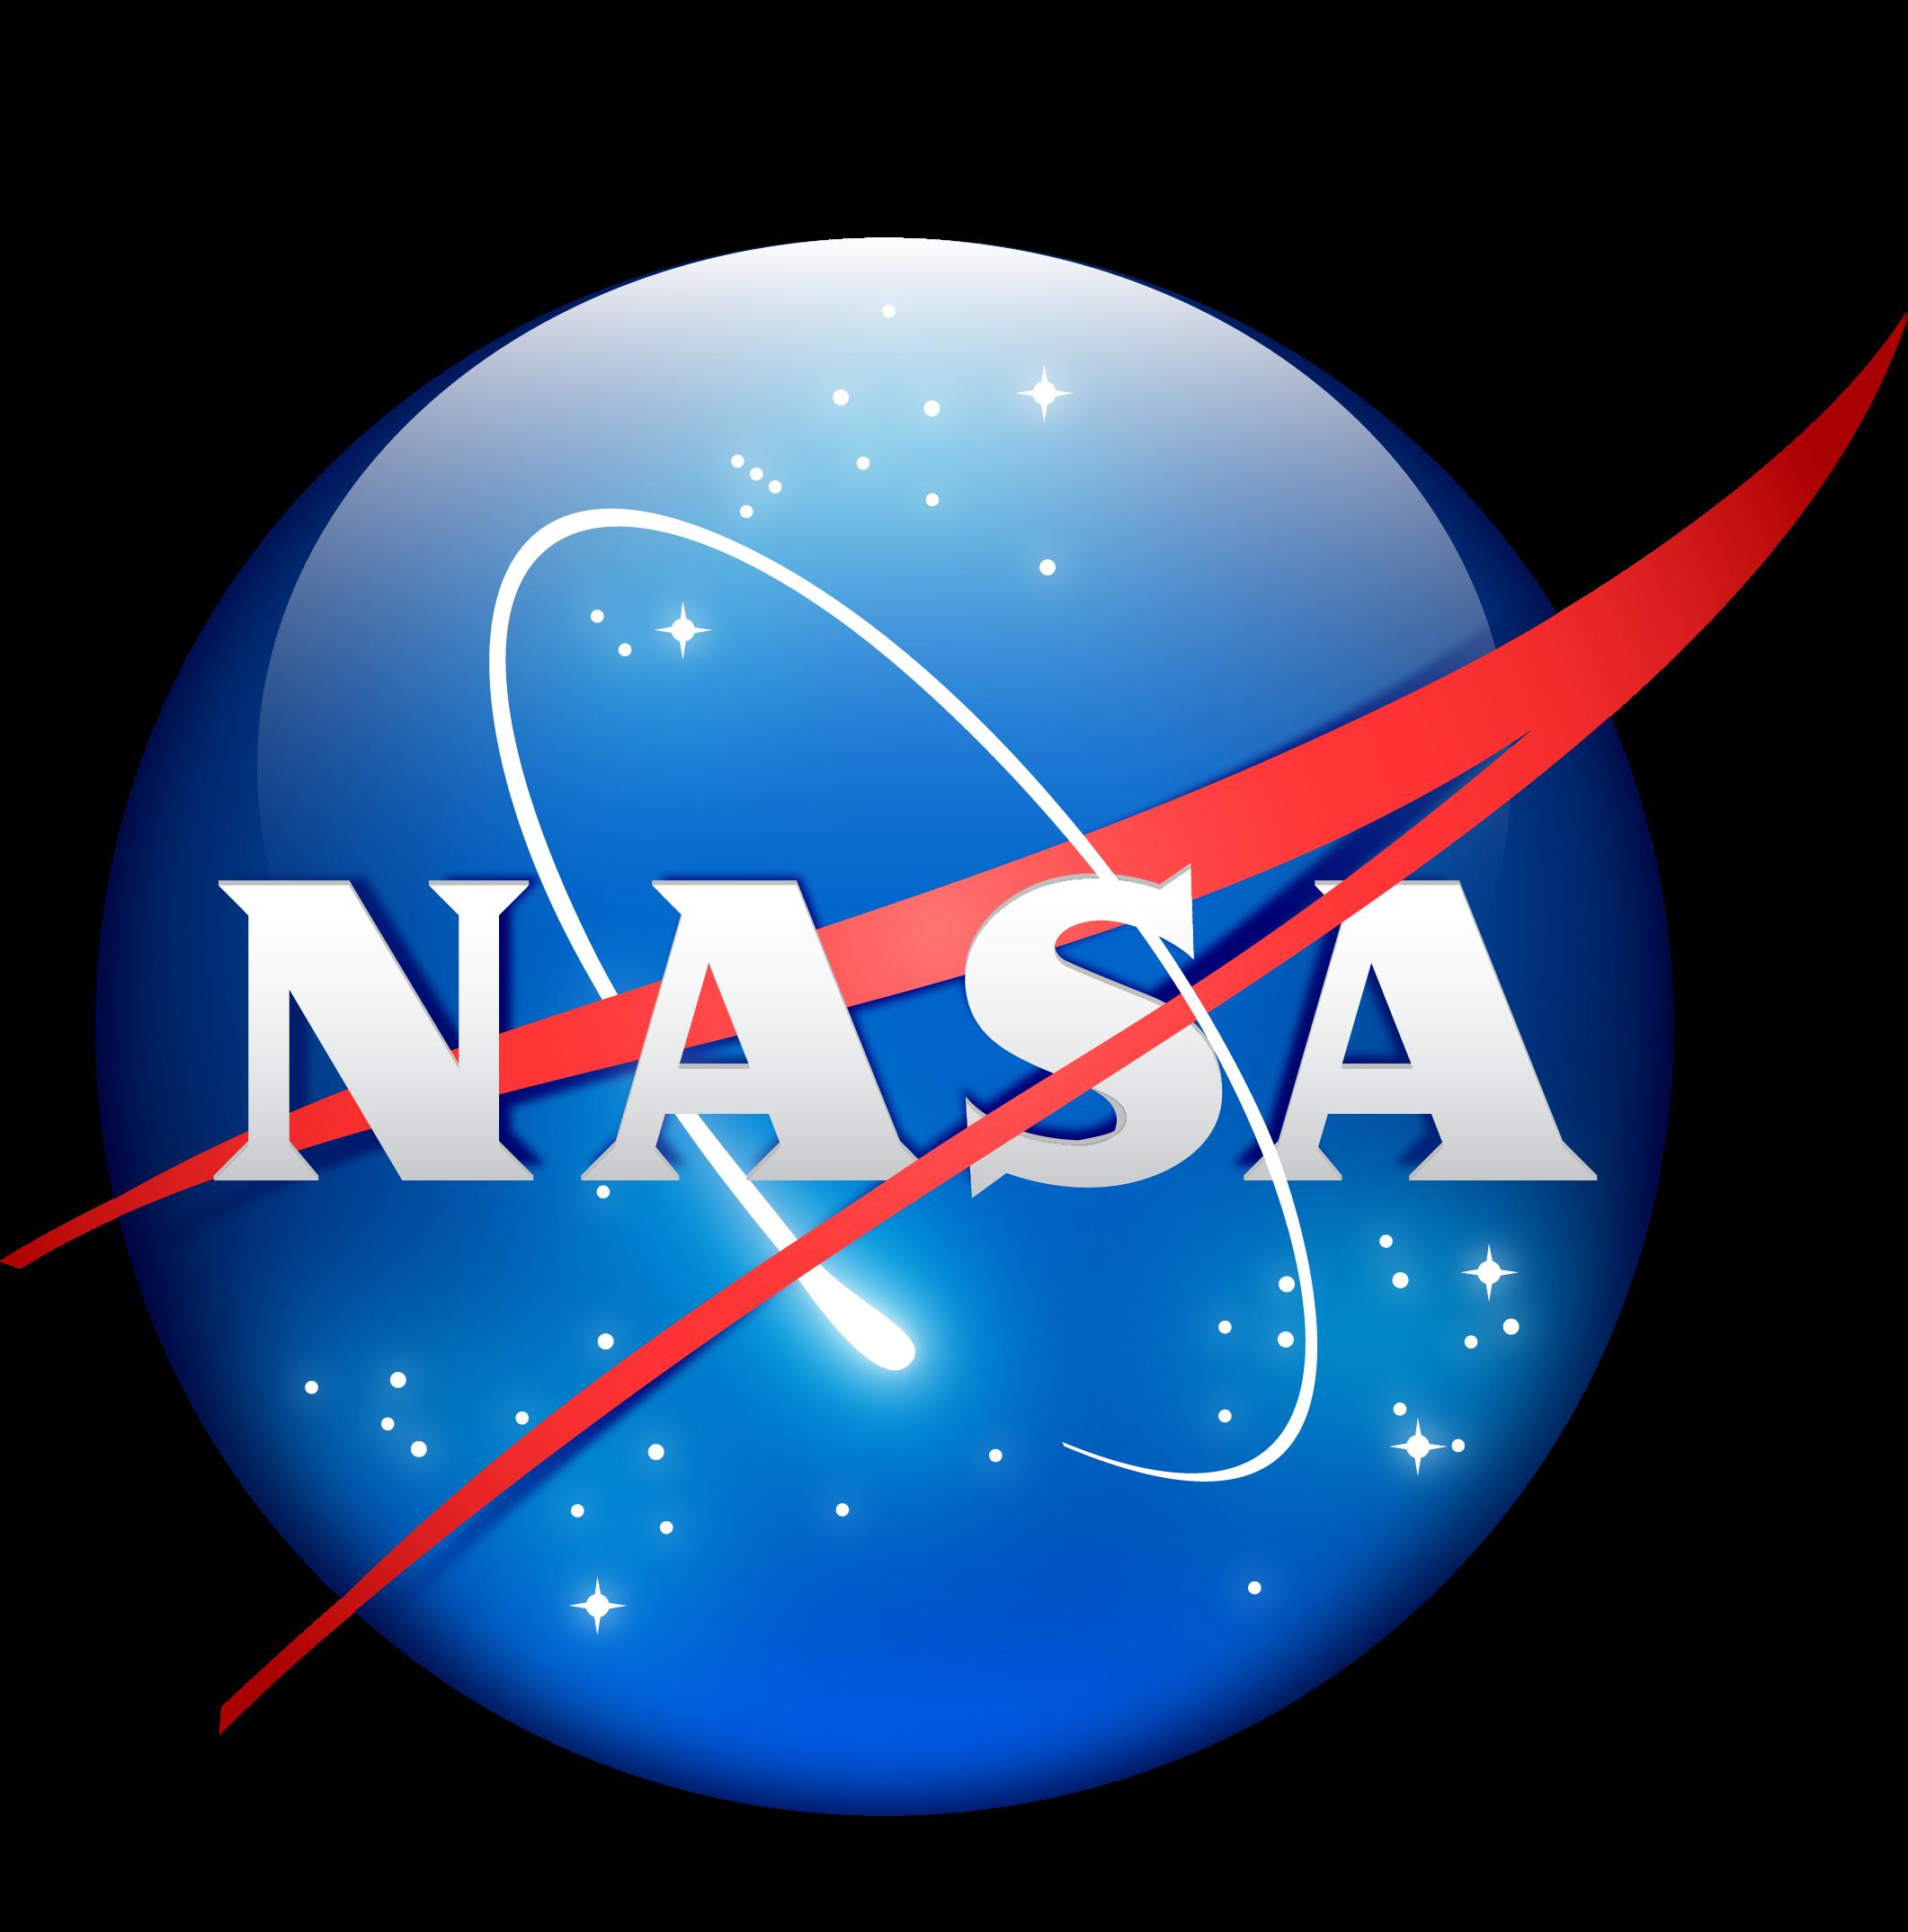 nasa space flag - photo #34